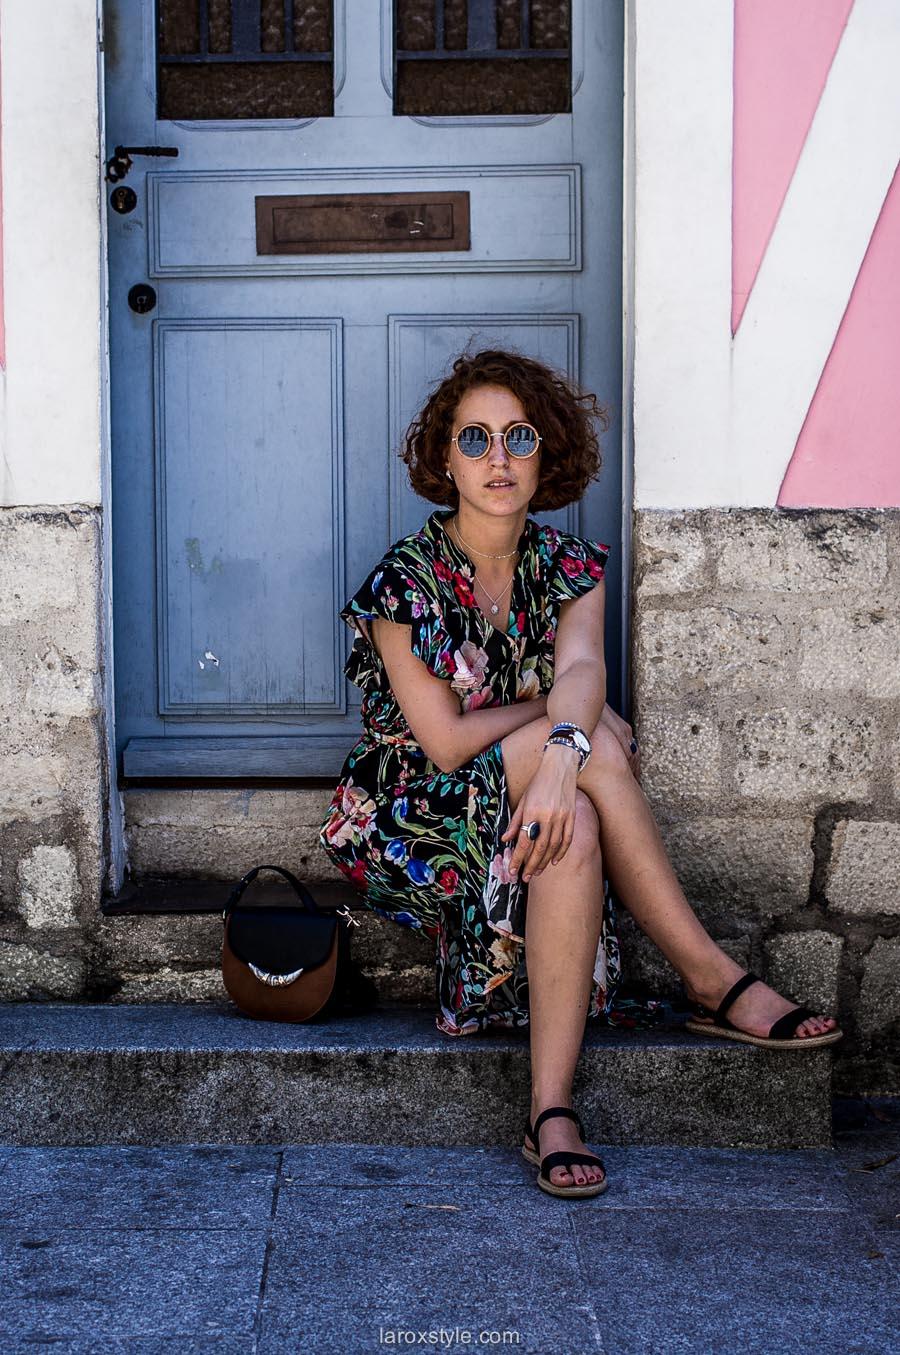 Paris - rue cremieux - robe longue zara - robe fleurs